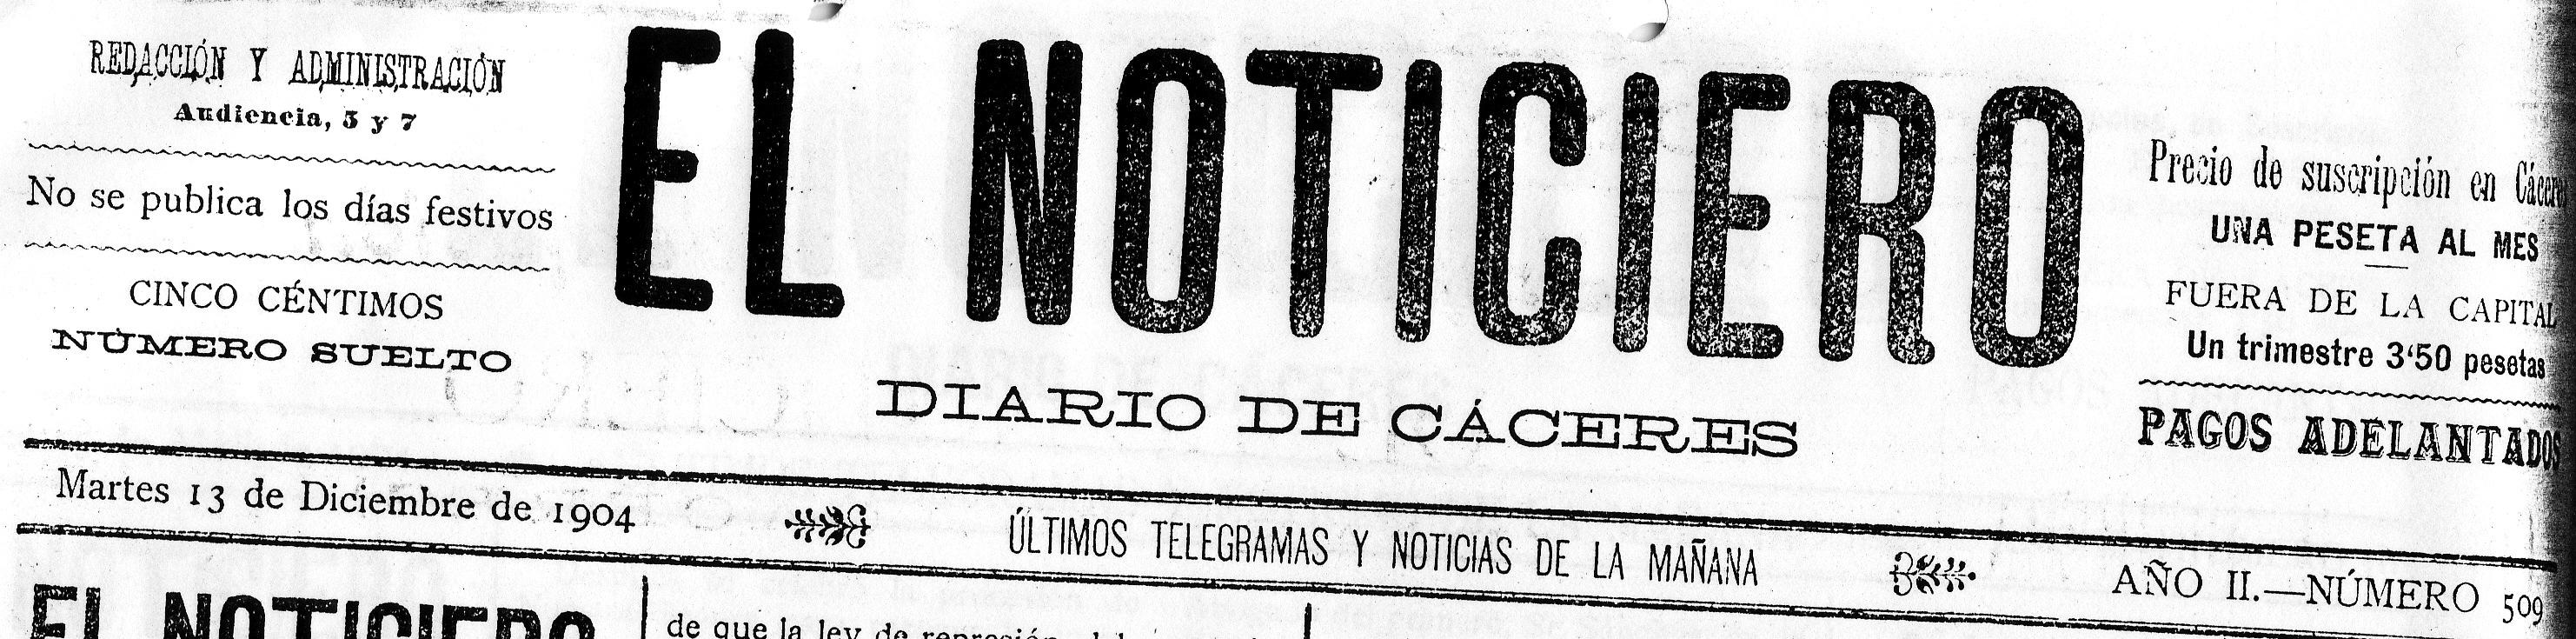 ElNoticiero